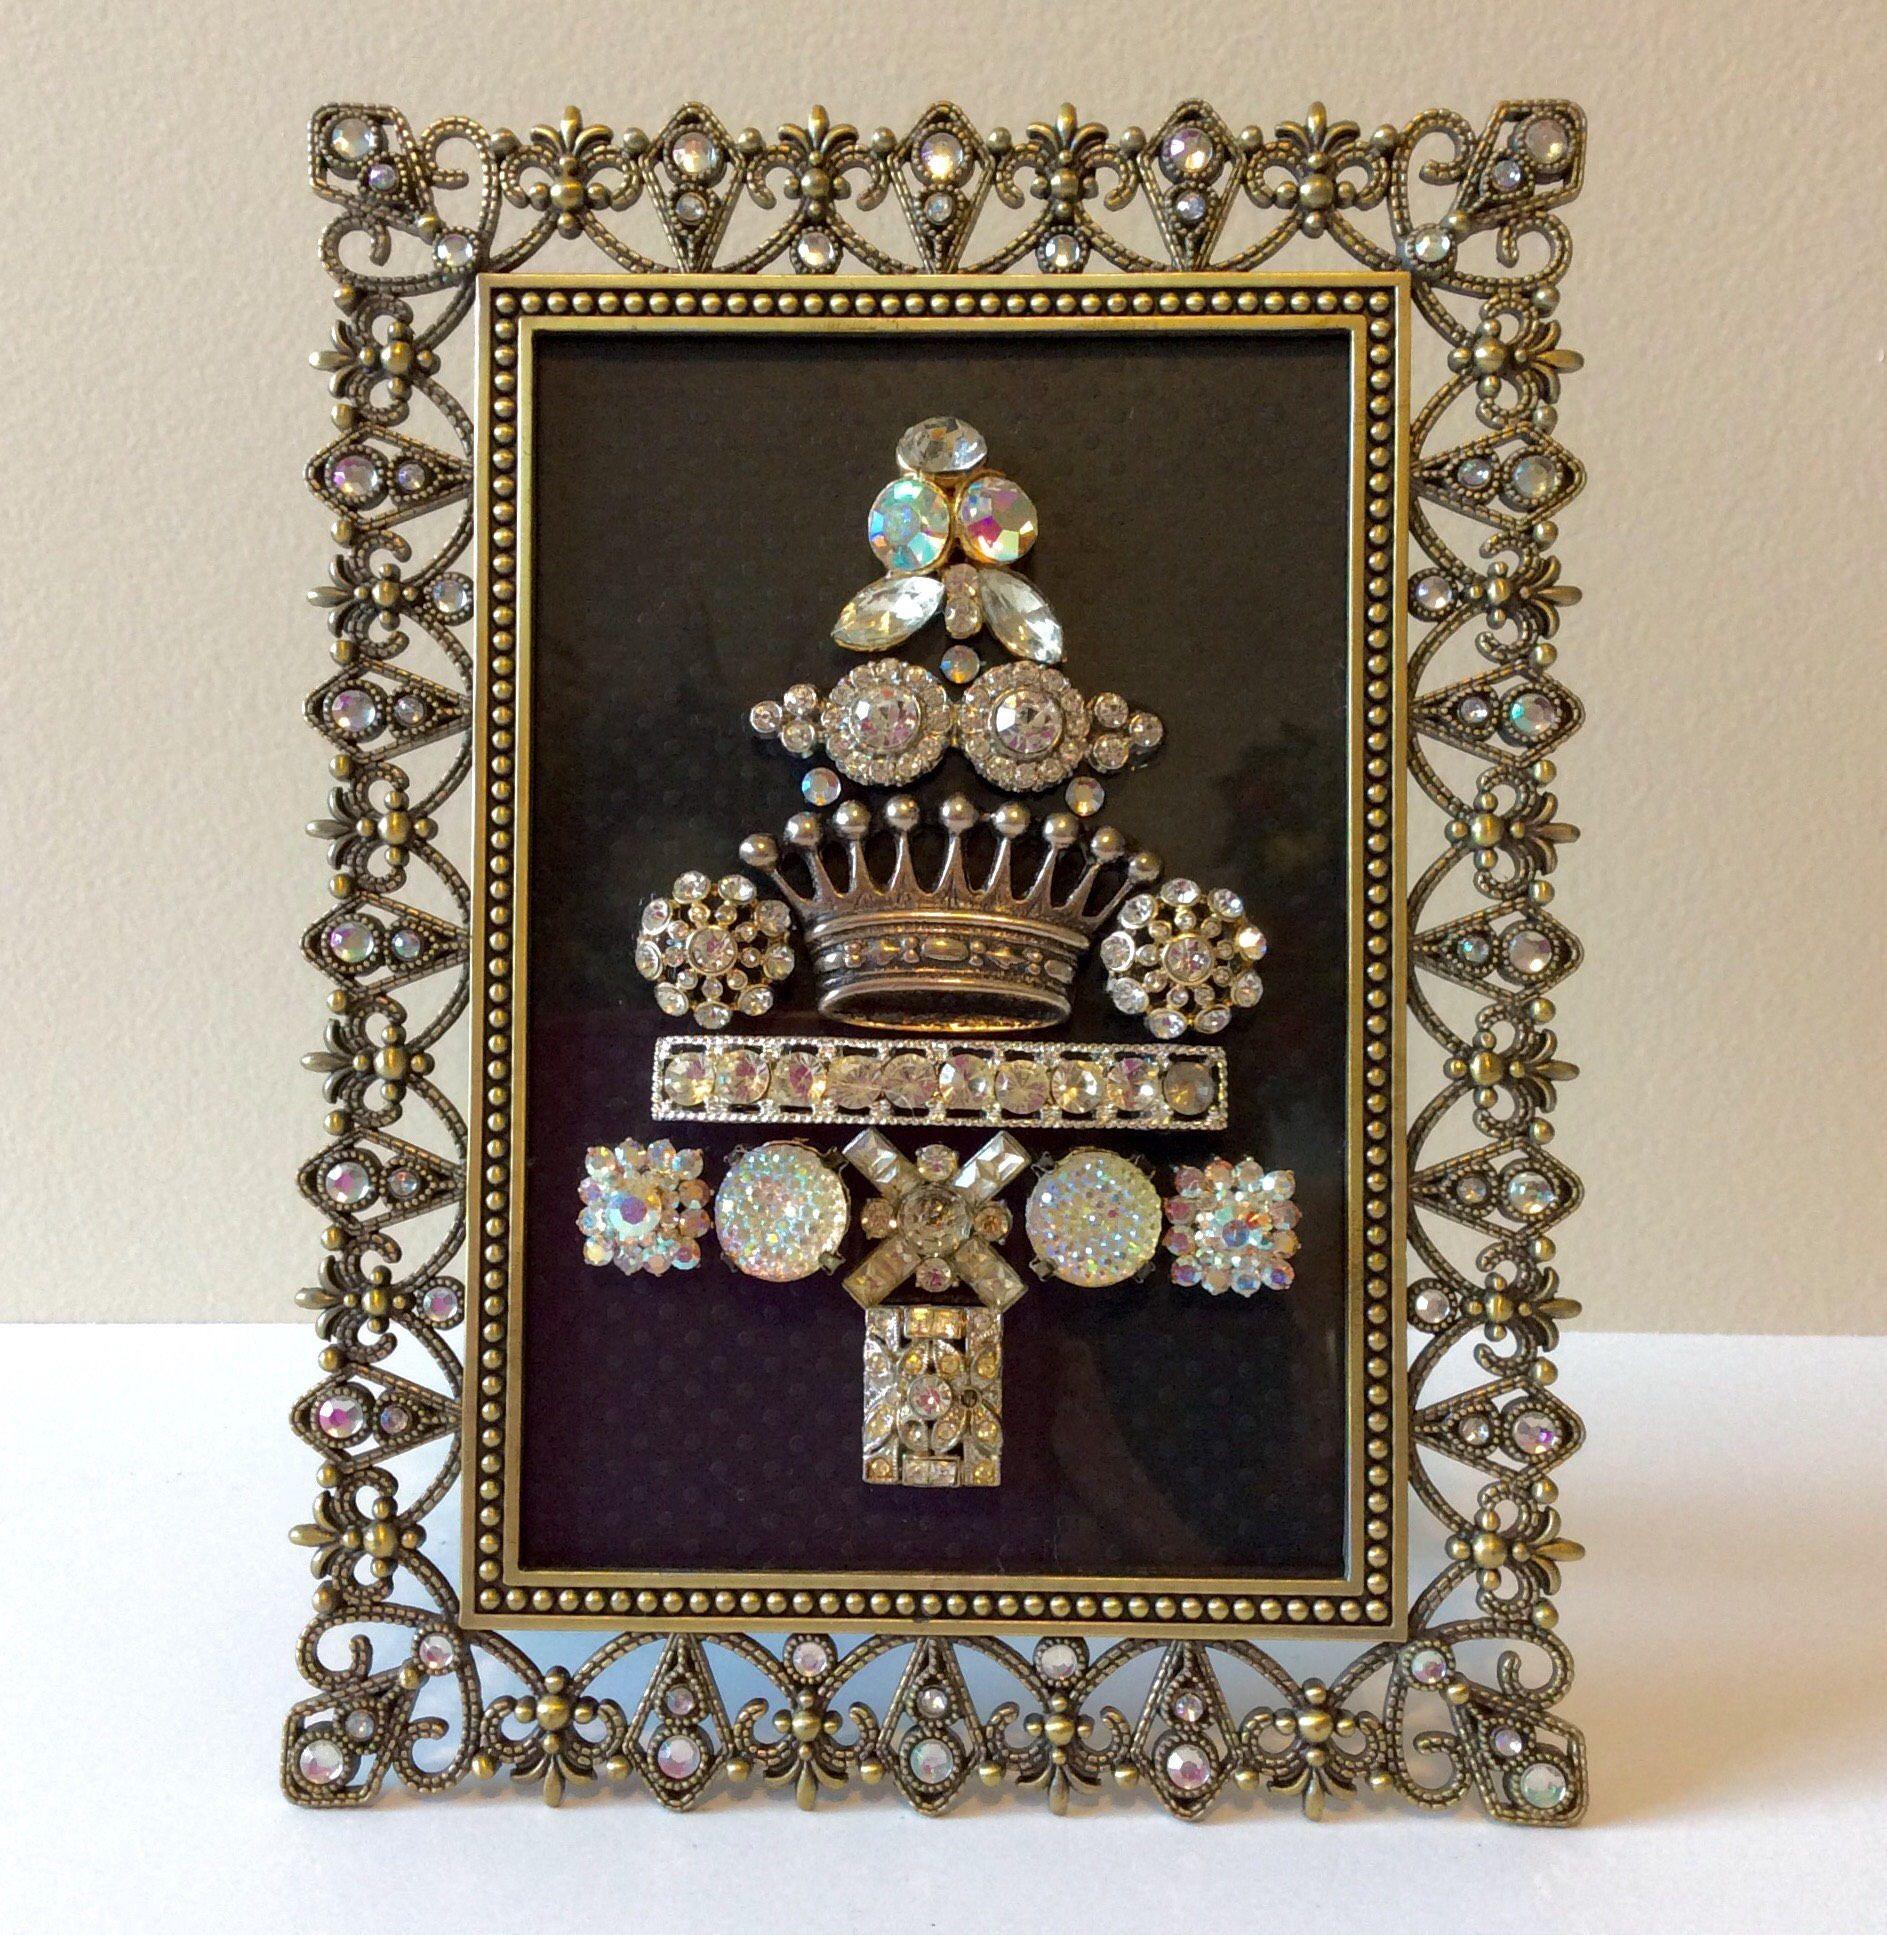 Vintage jewelry Christmas tree art in jeweled filigree frame   Deck ...